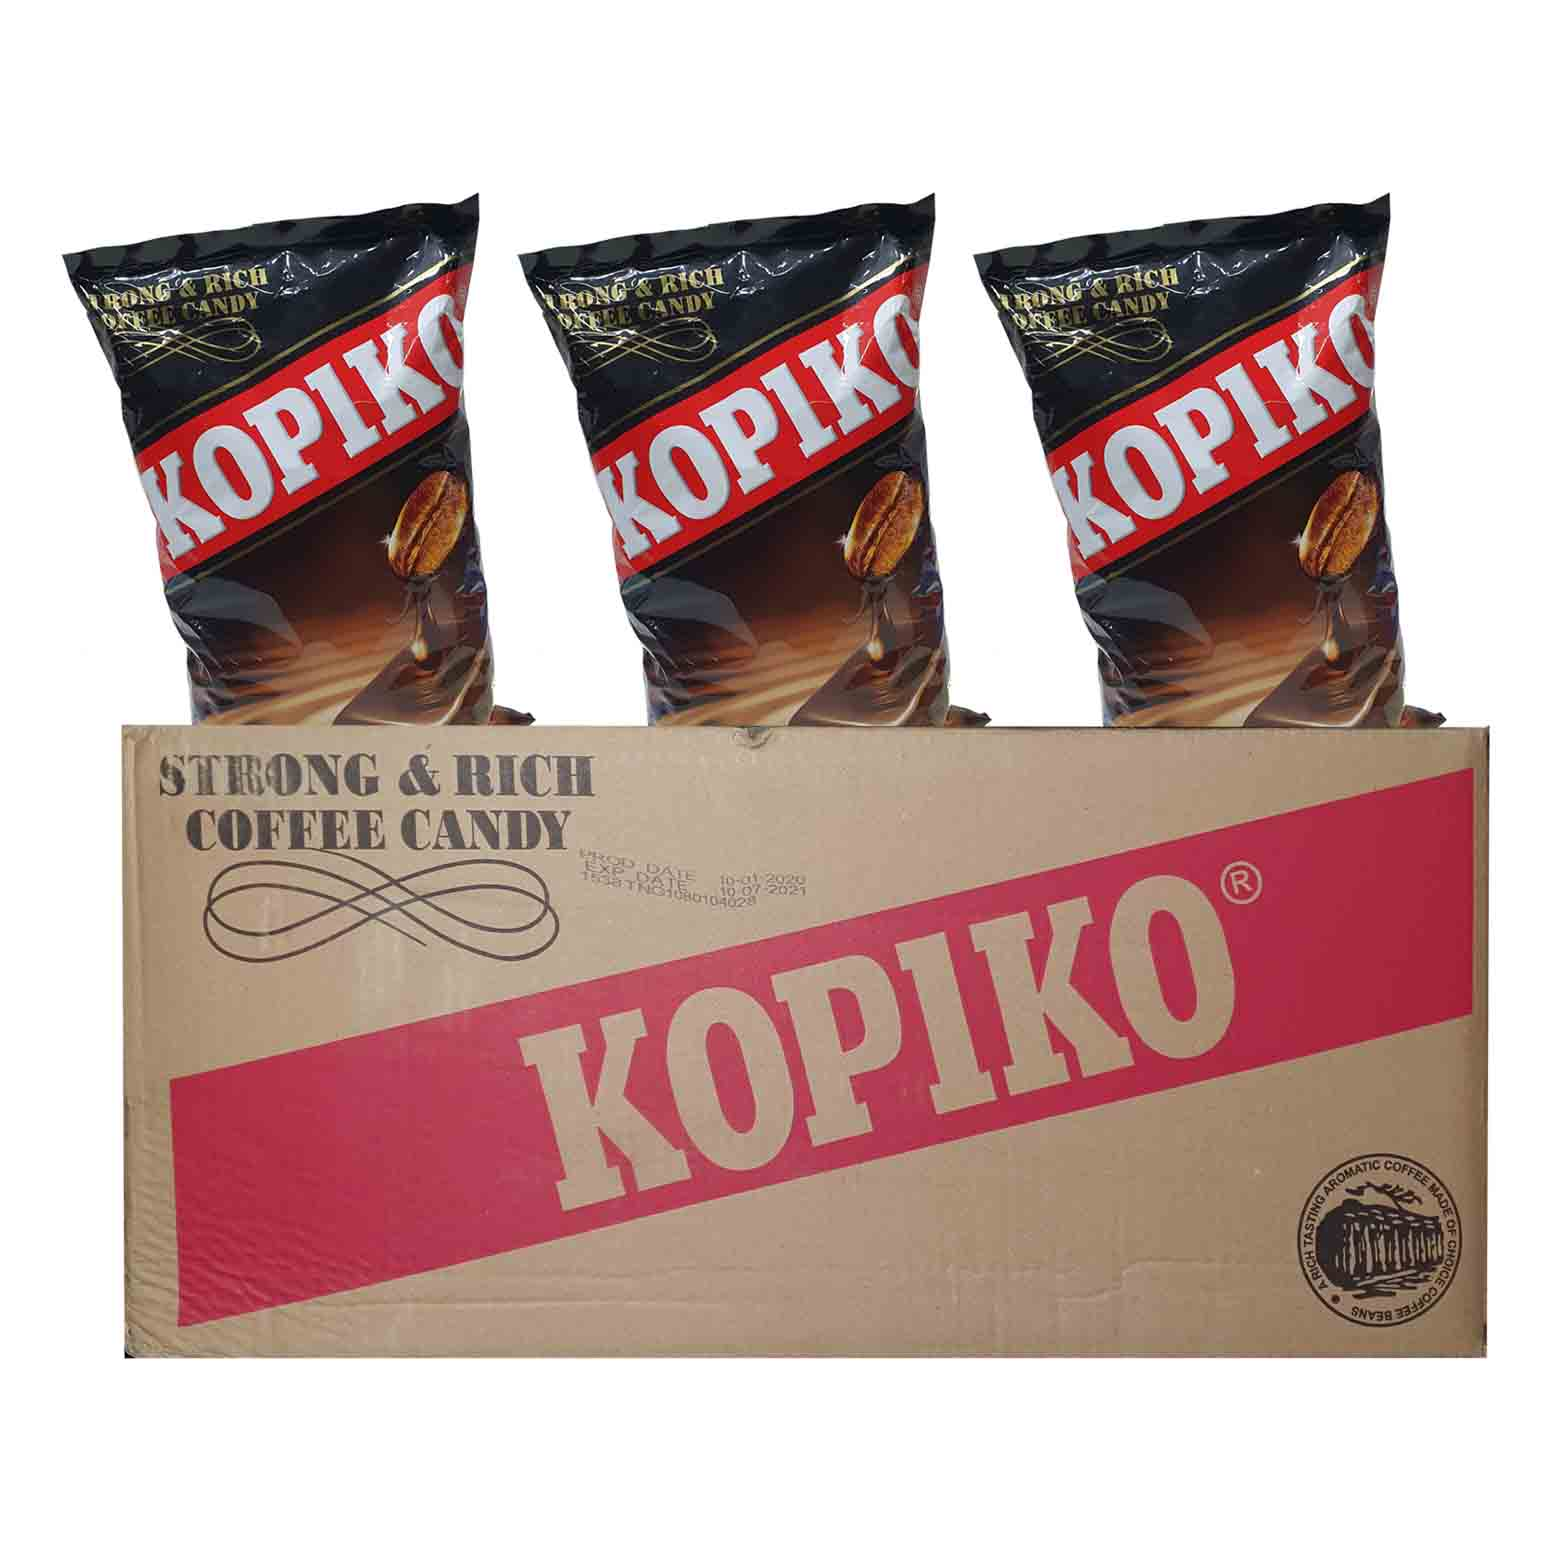 Kopiko Coffee Candy 800g x 20 Ctn